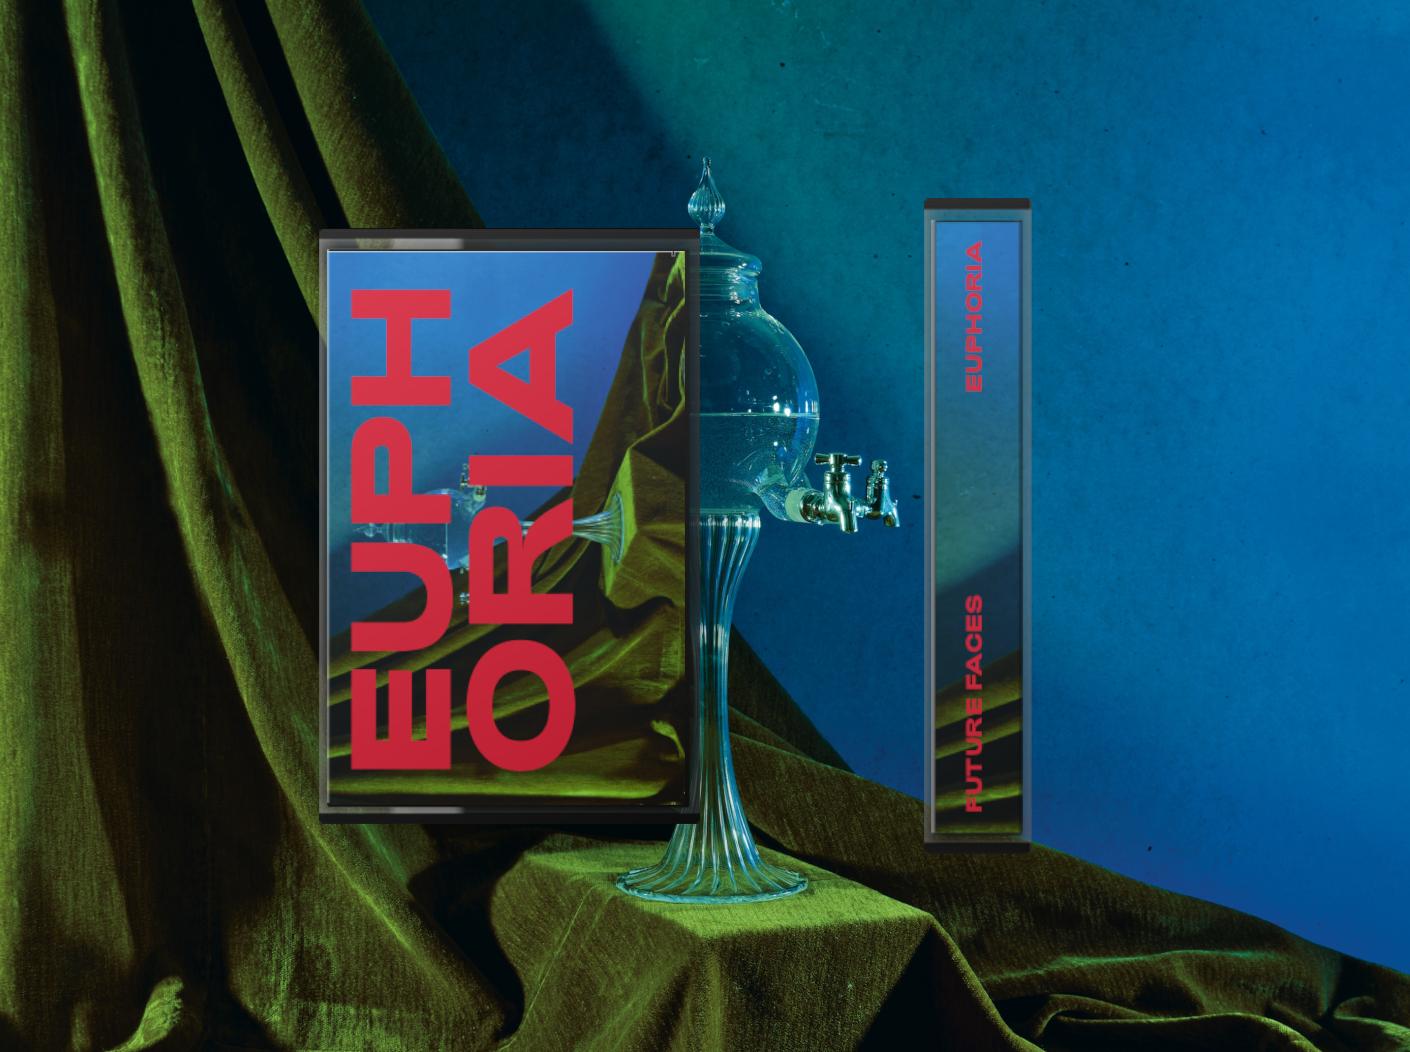 Future Faces - Euphoria - Limited Cassette